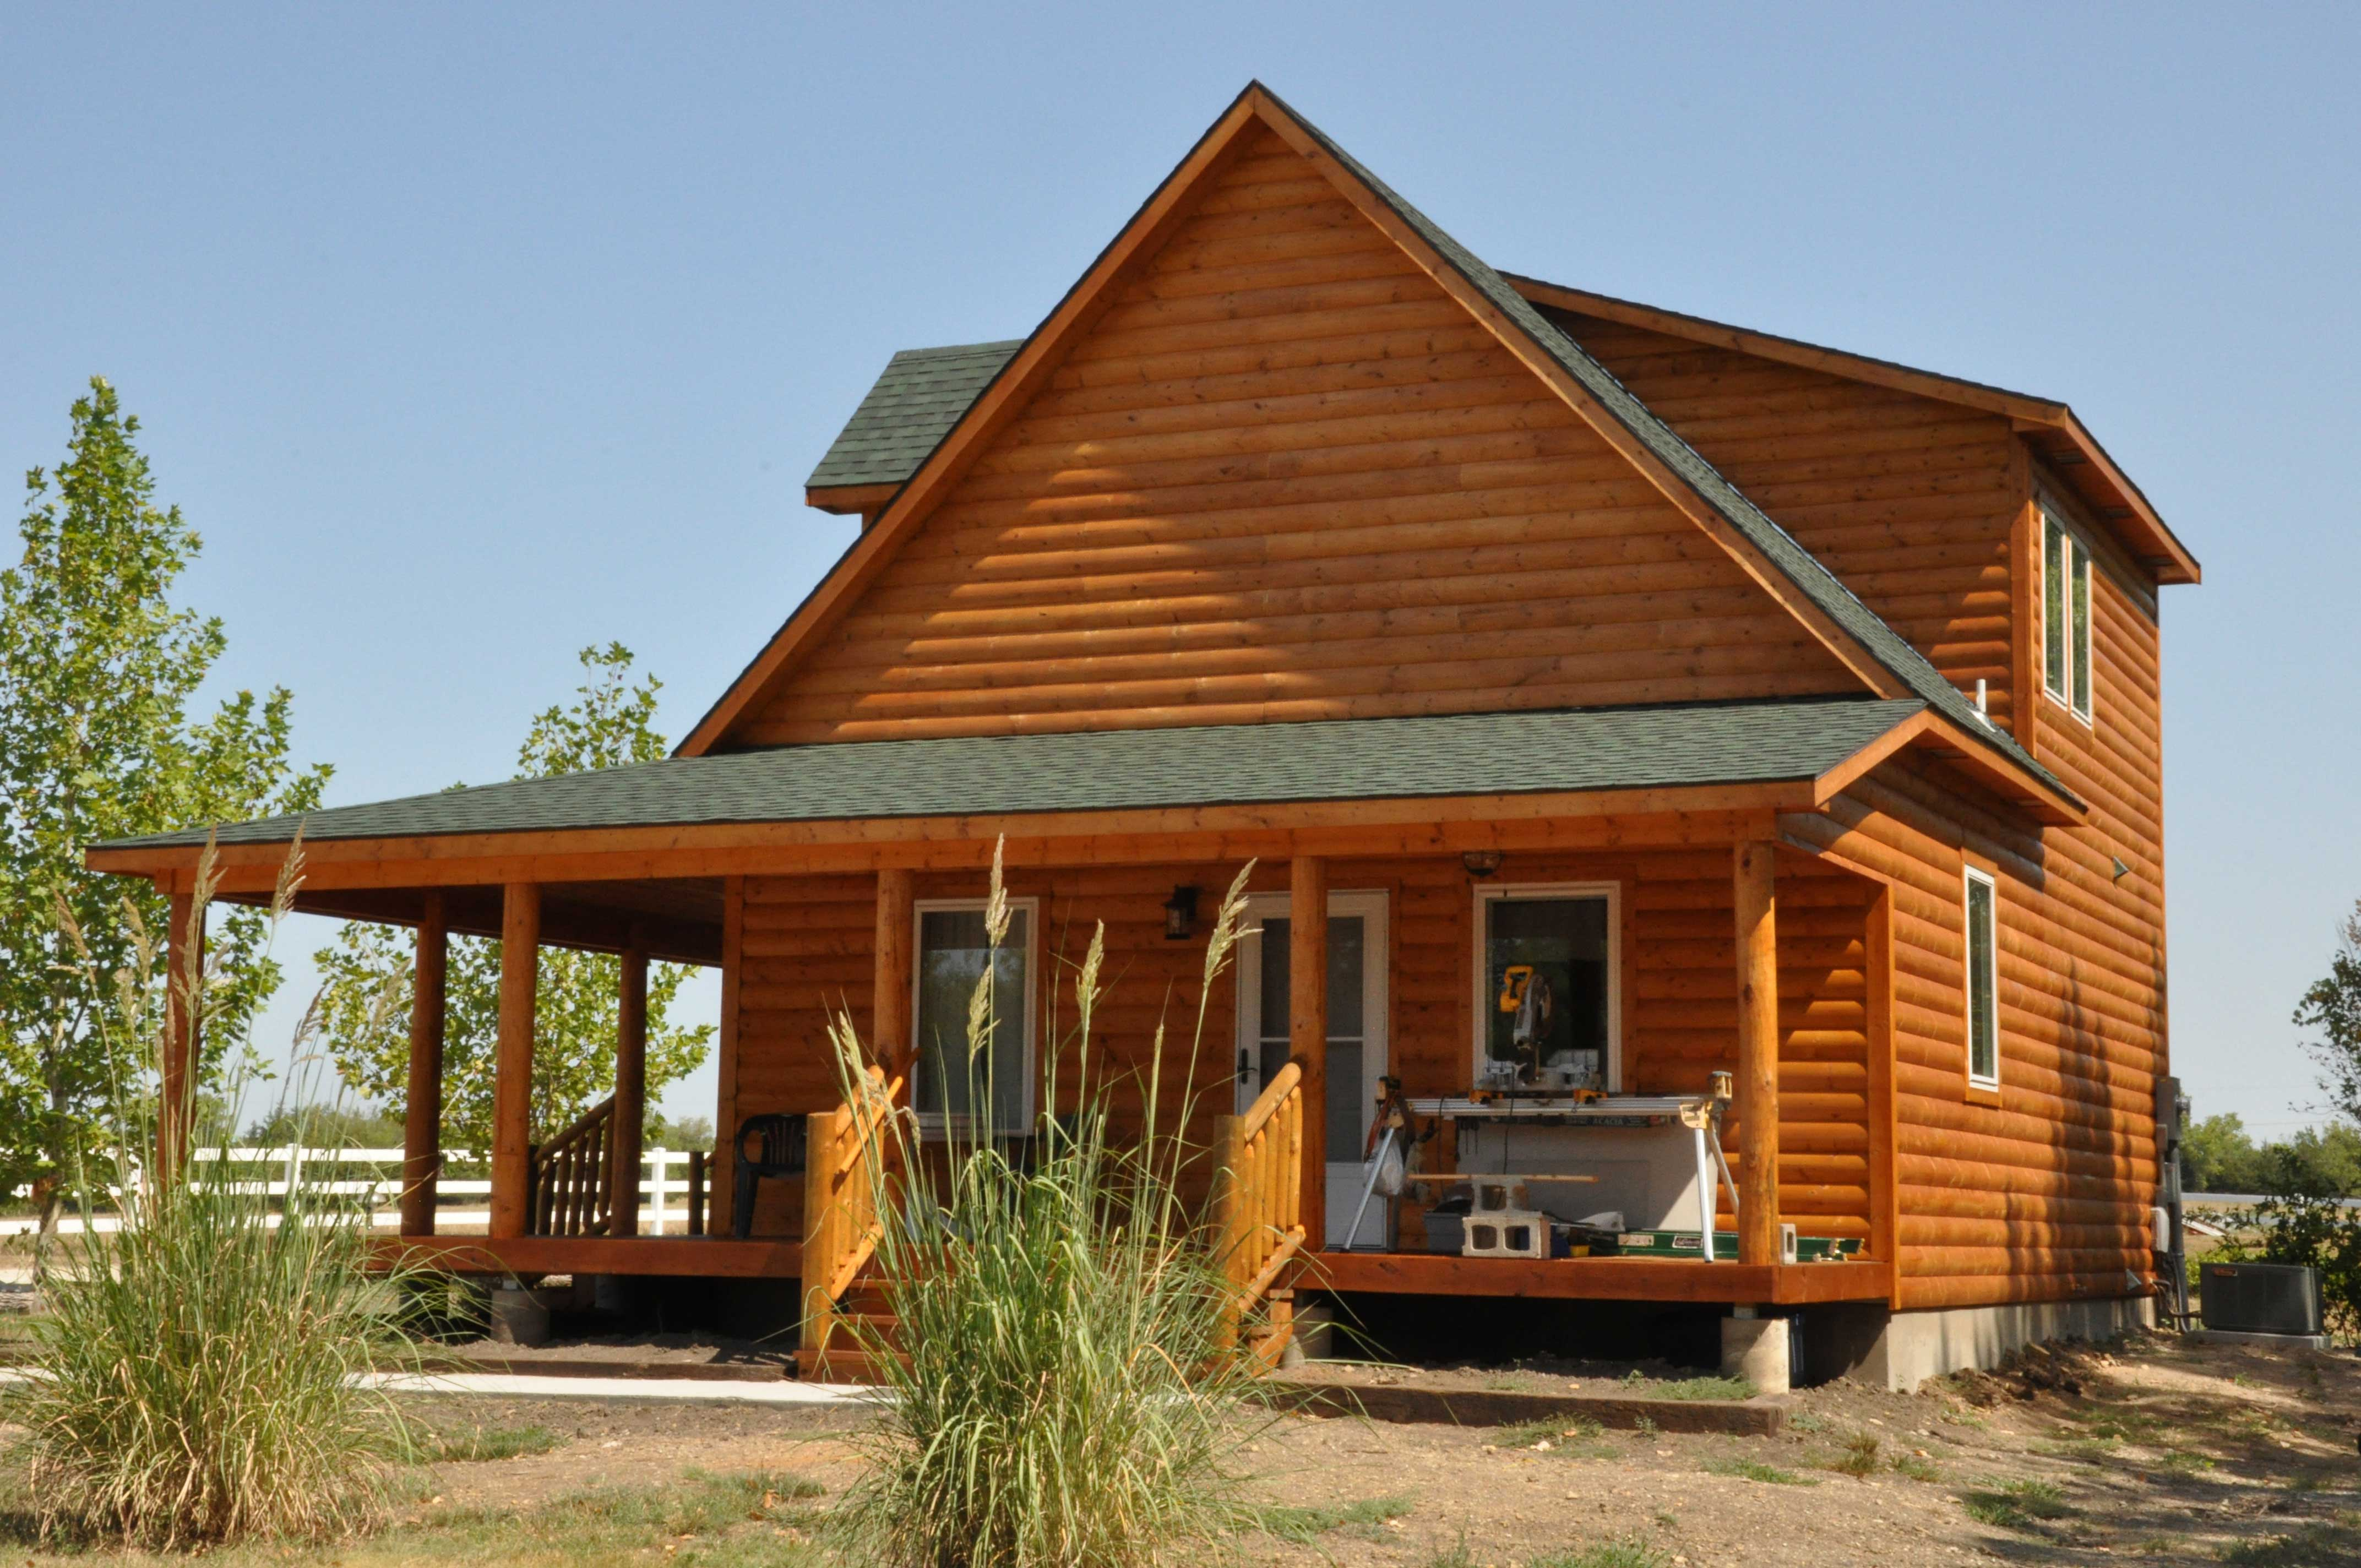 Sturdi Bilt Wrapped Porch Cabins